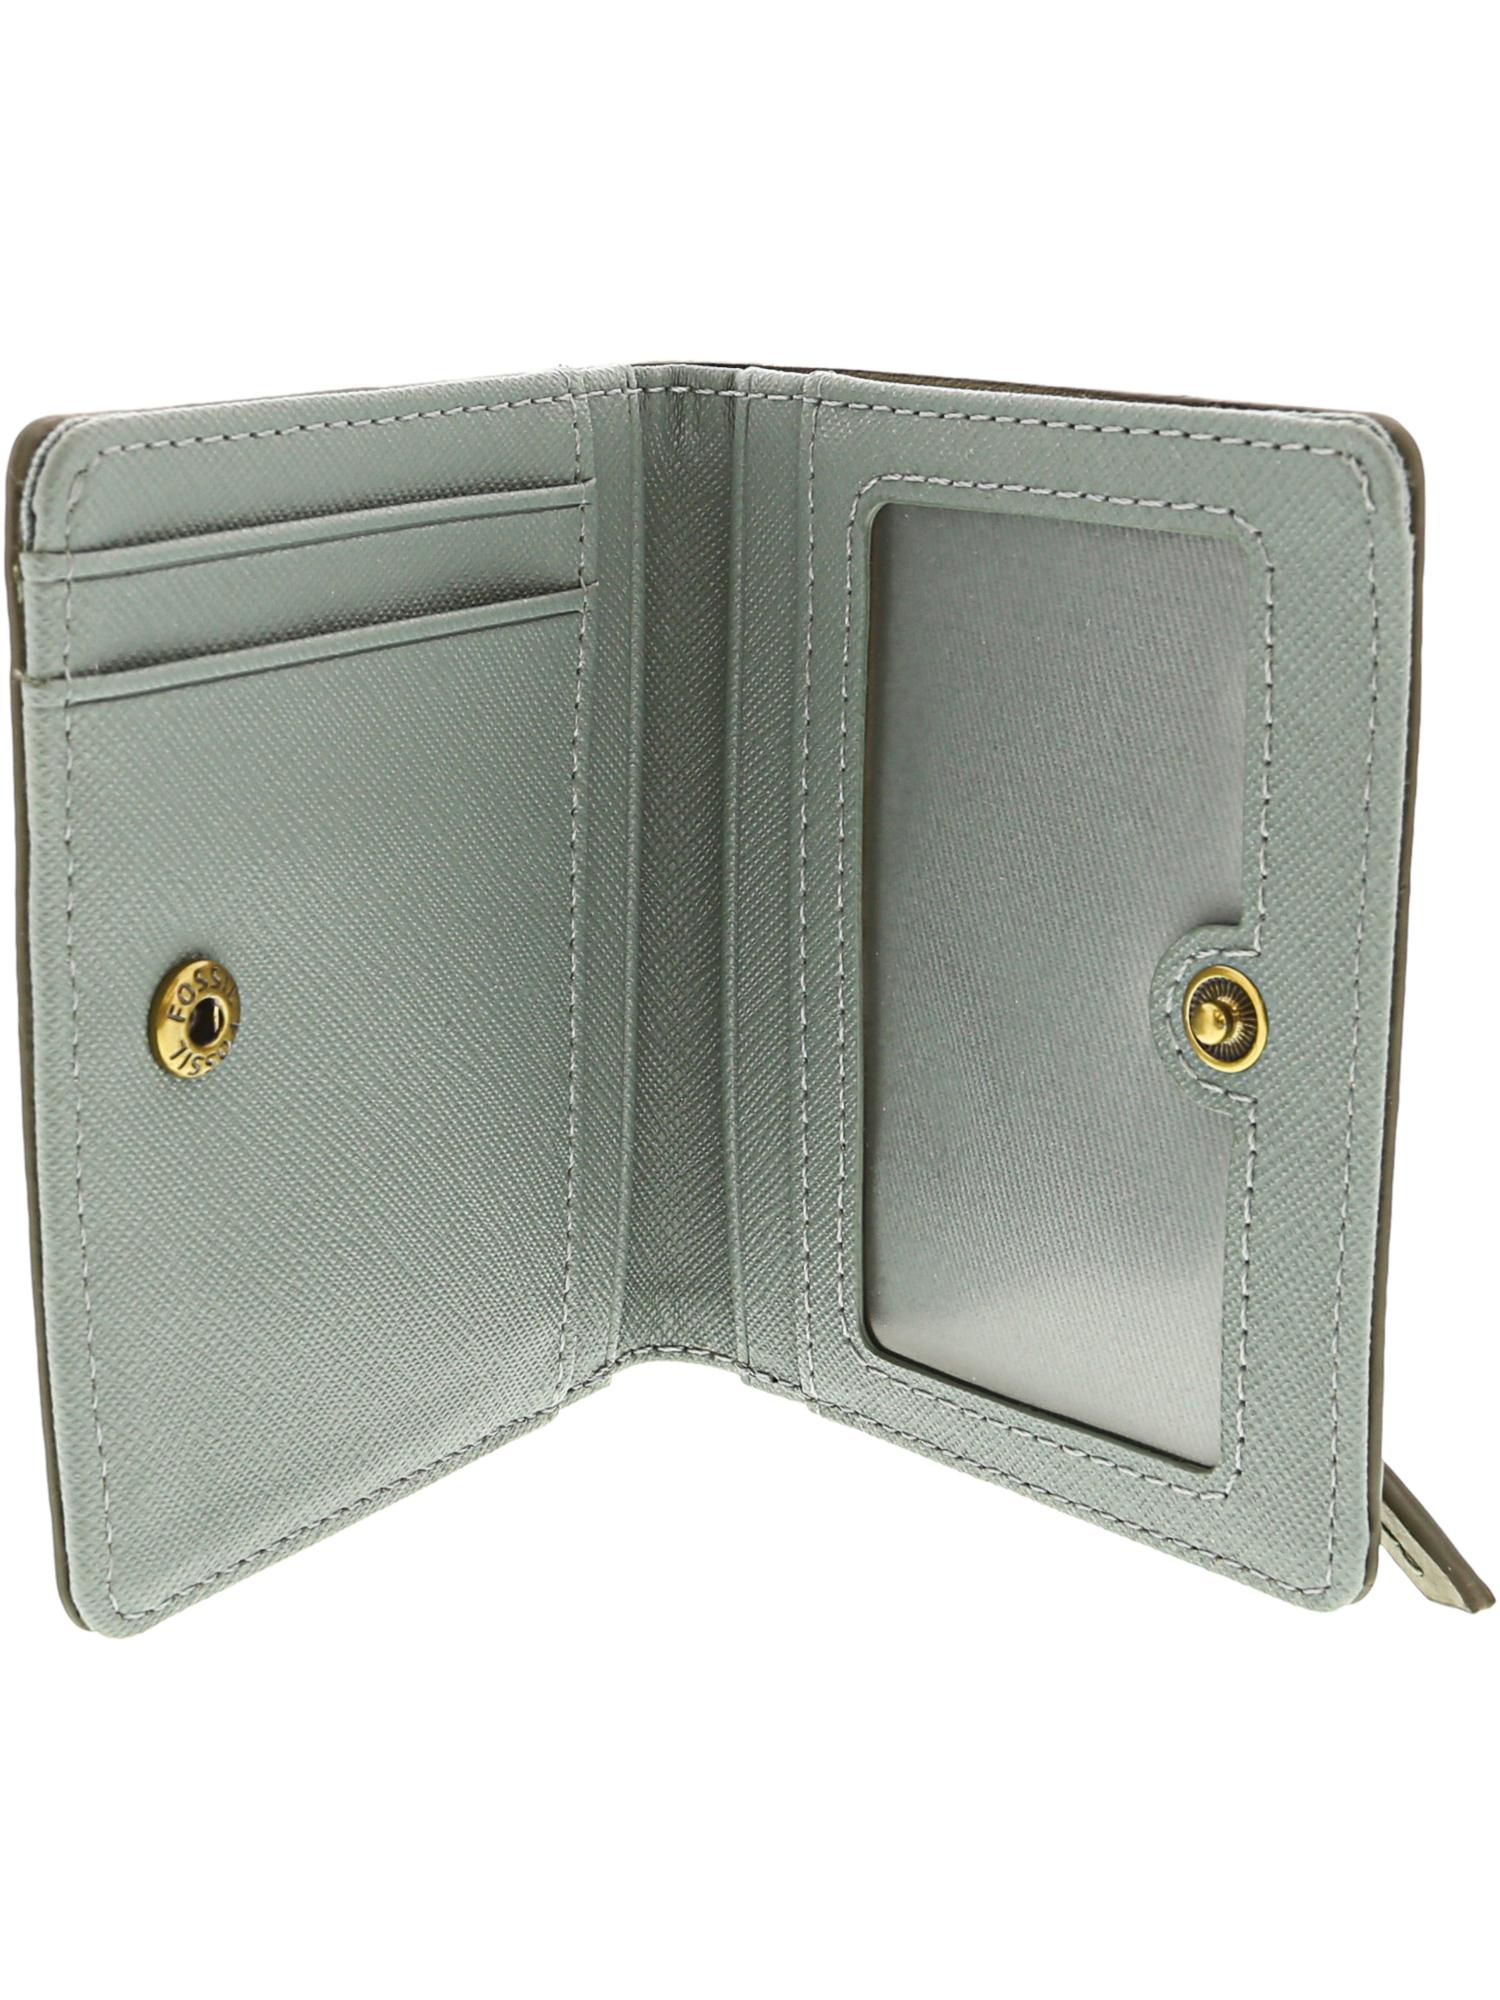 Fossil-Women-039-s-Emma-Rfid-Mini-Leather-Wallet thumbnail 34